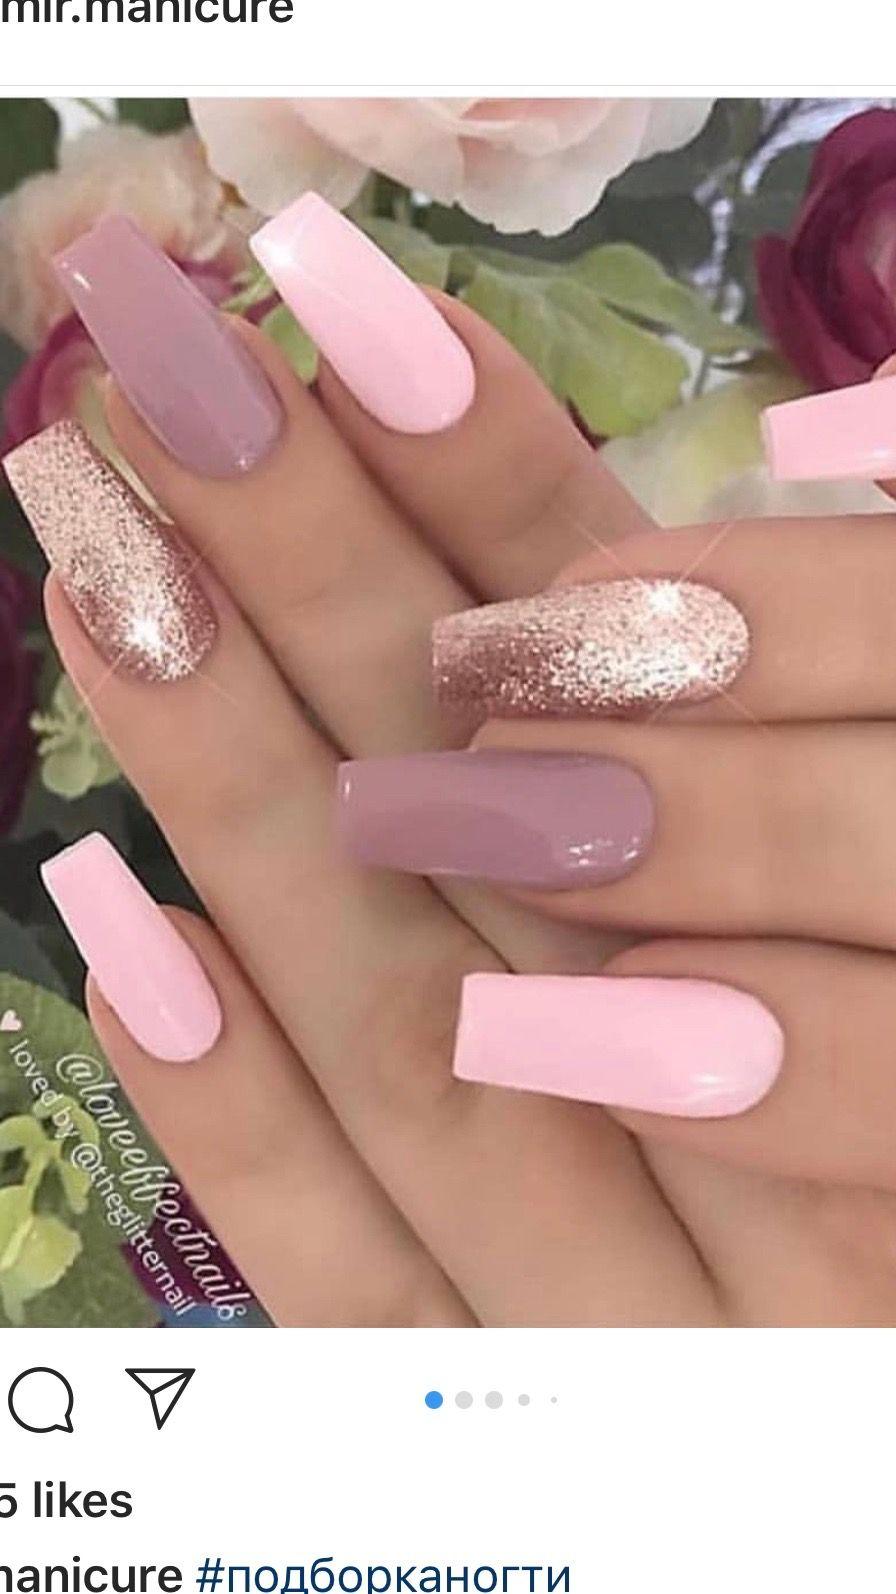 Pin By Yame On Nail Designs In 2020 Pink Nail Art Pink Nails